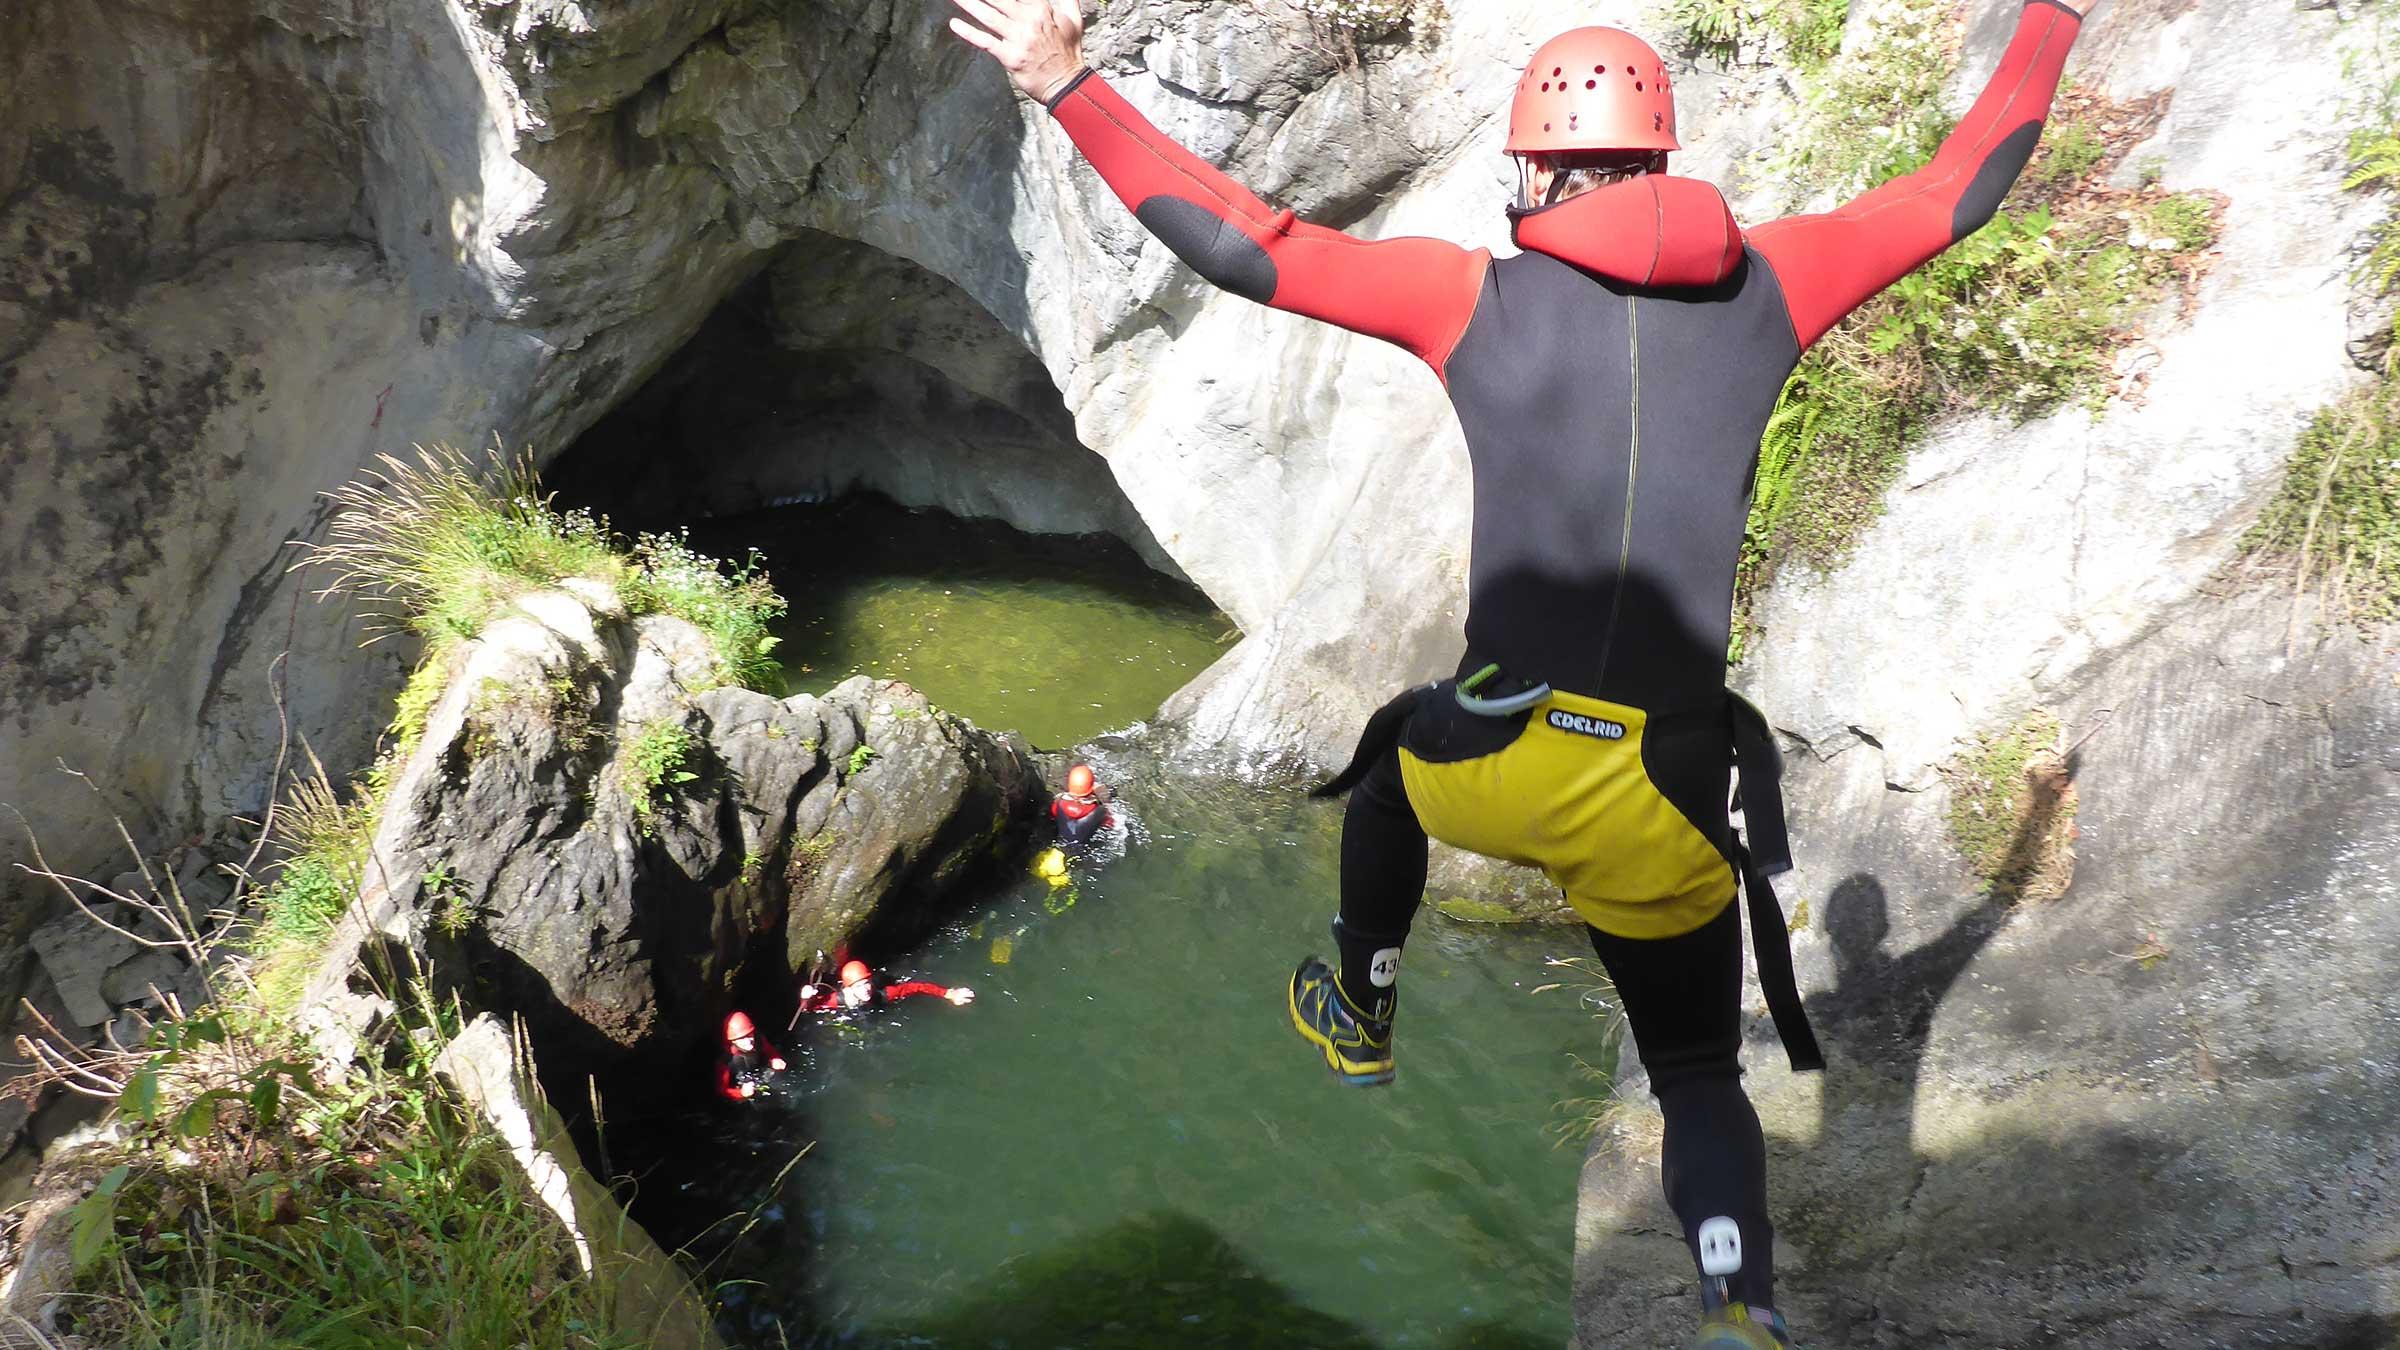 Canyoning Sprung - Canyoning und Rafting im Ötztal